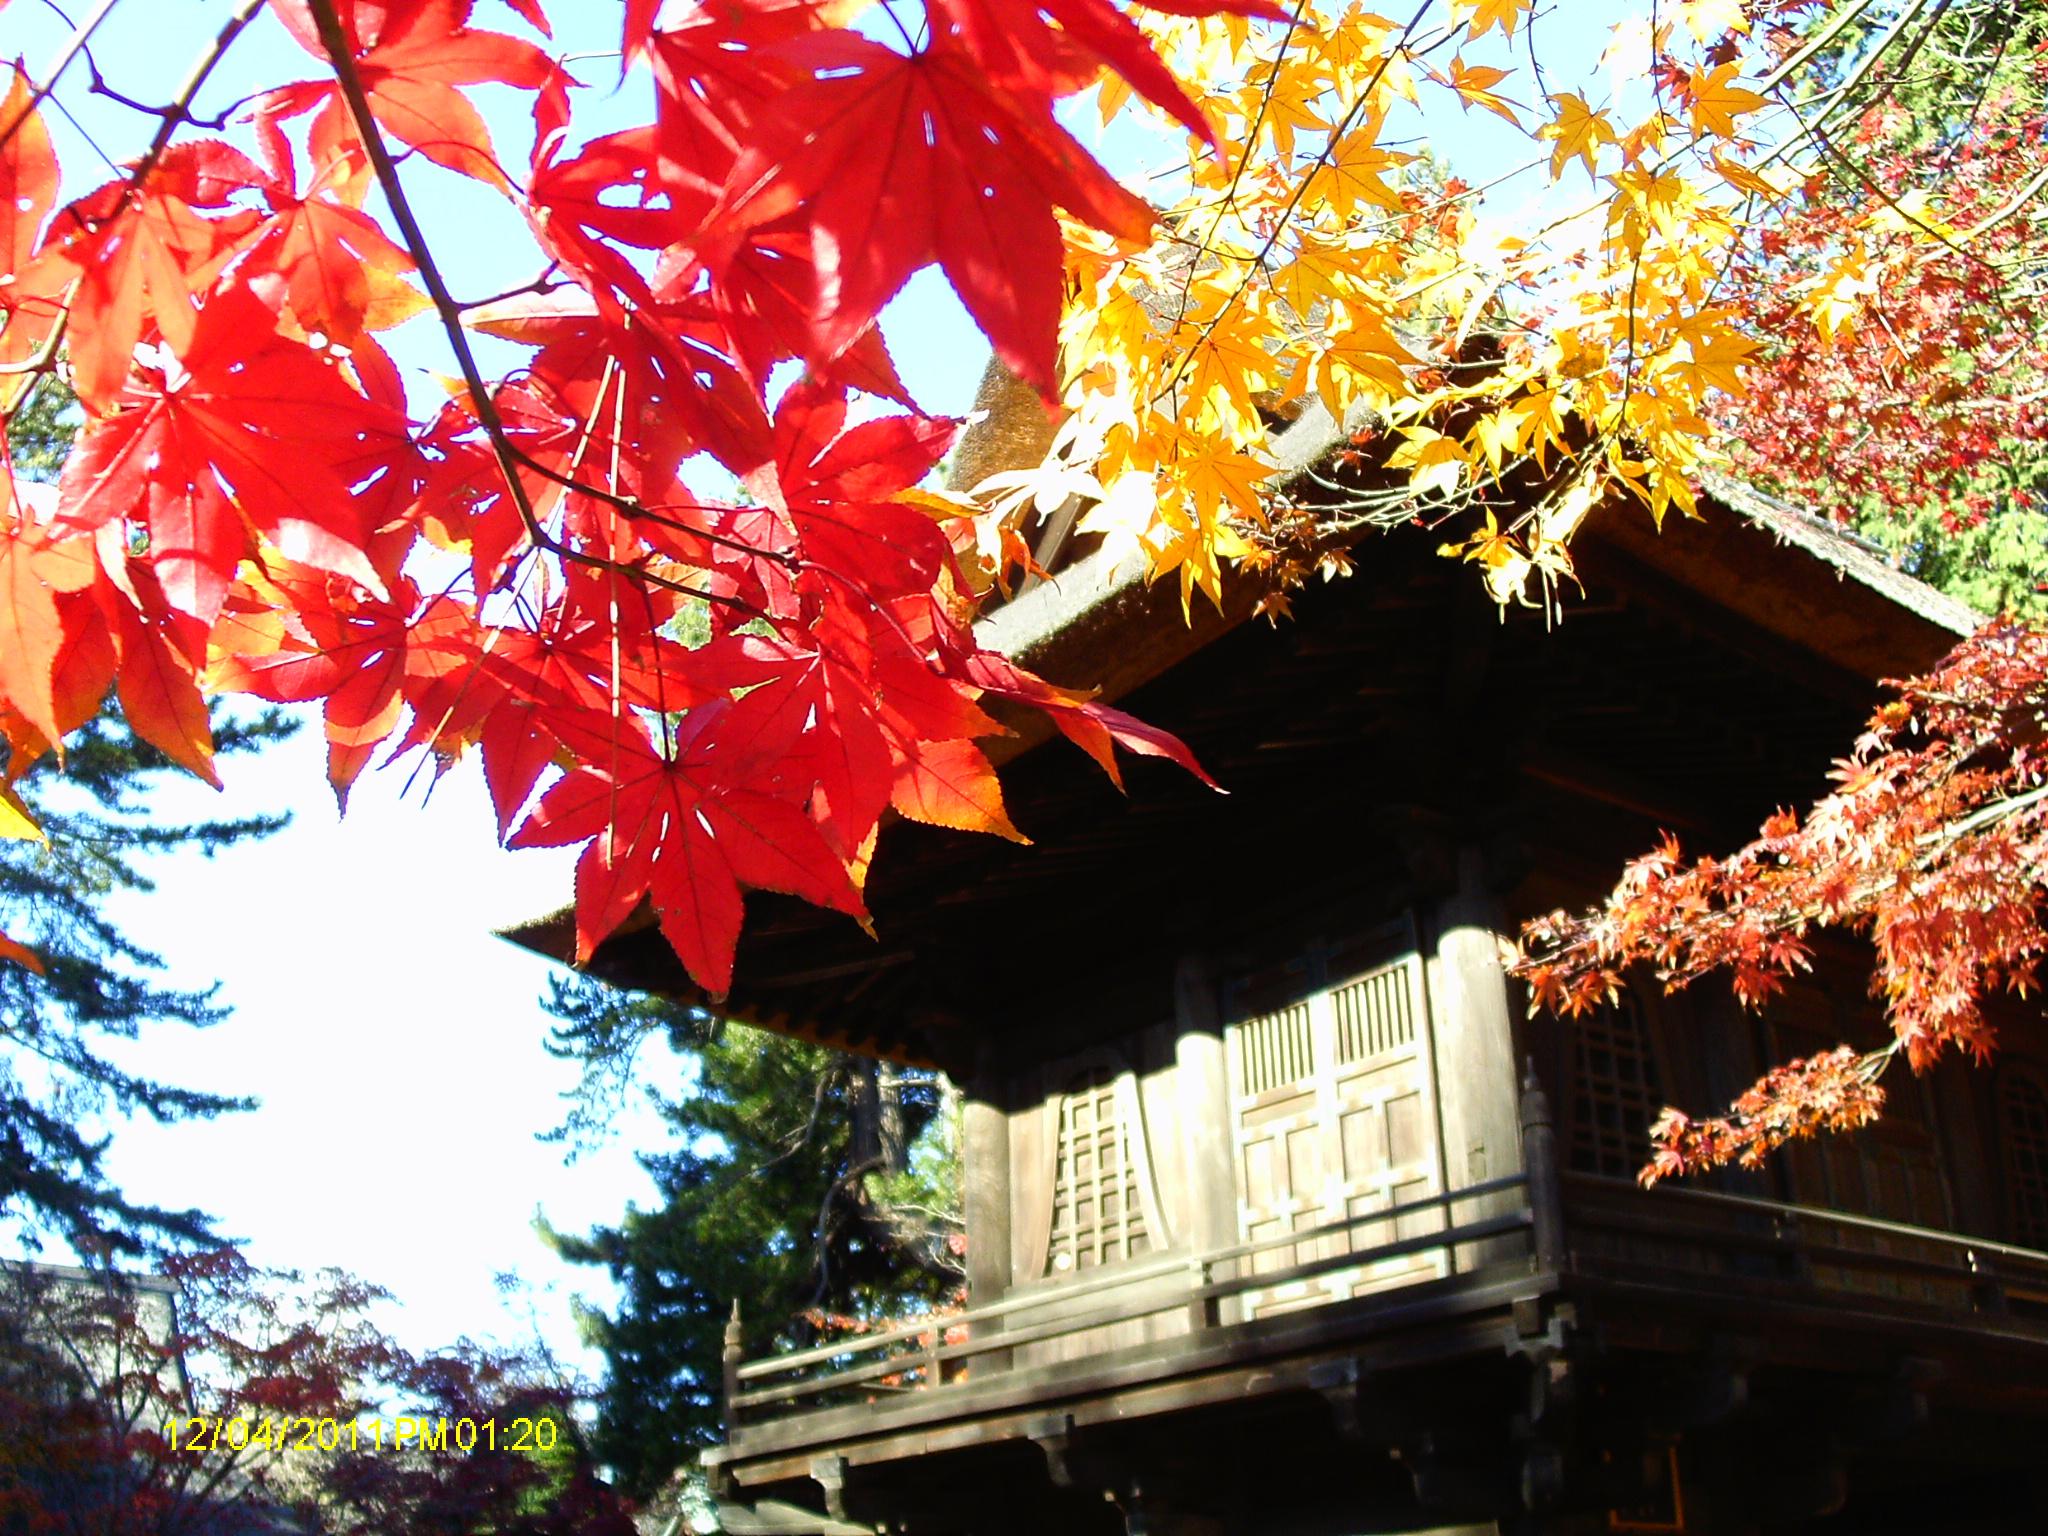 acer momiji no jardim japonês